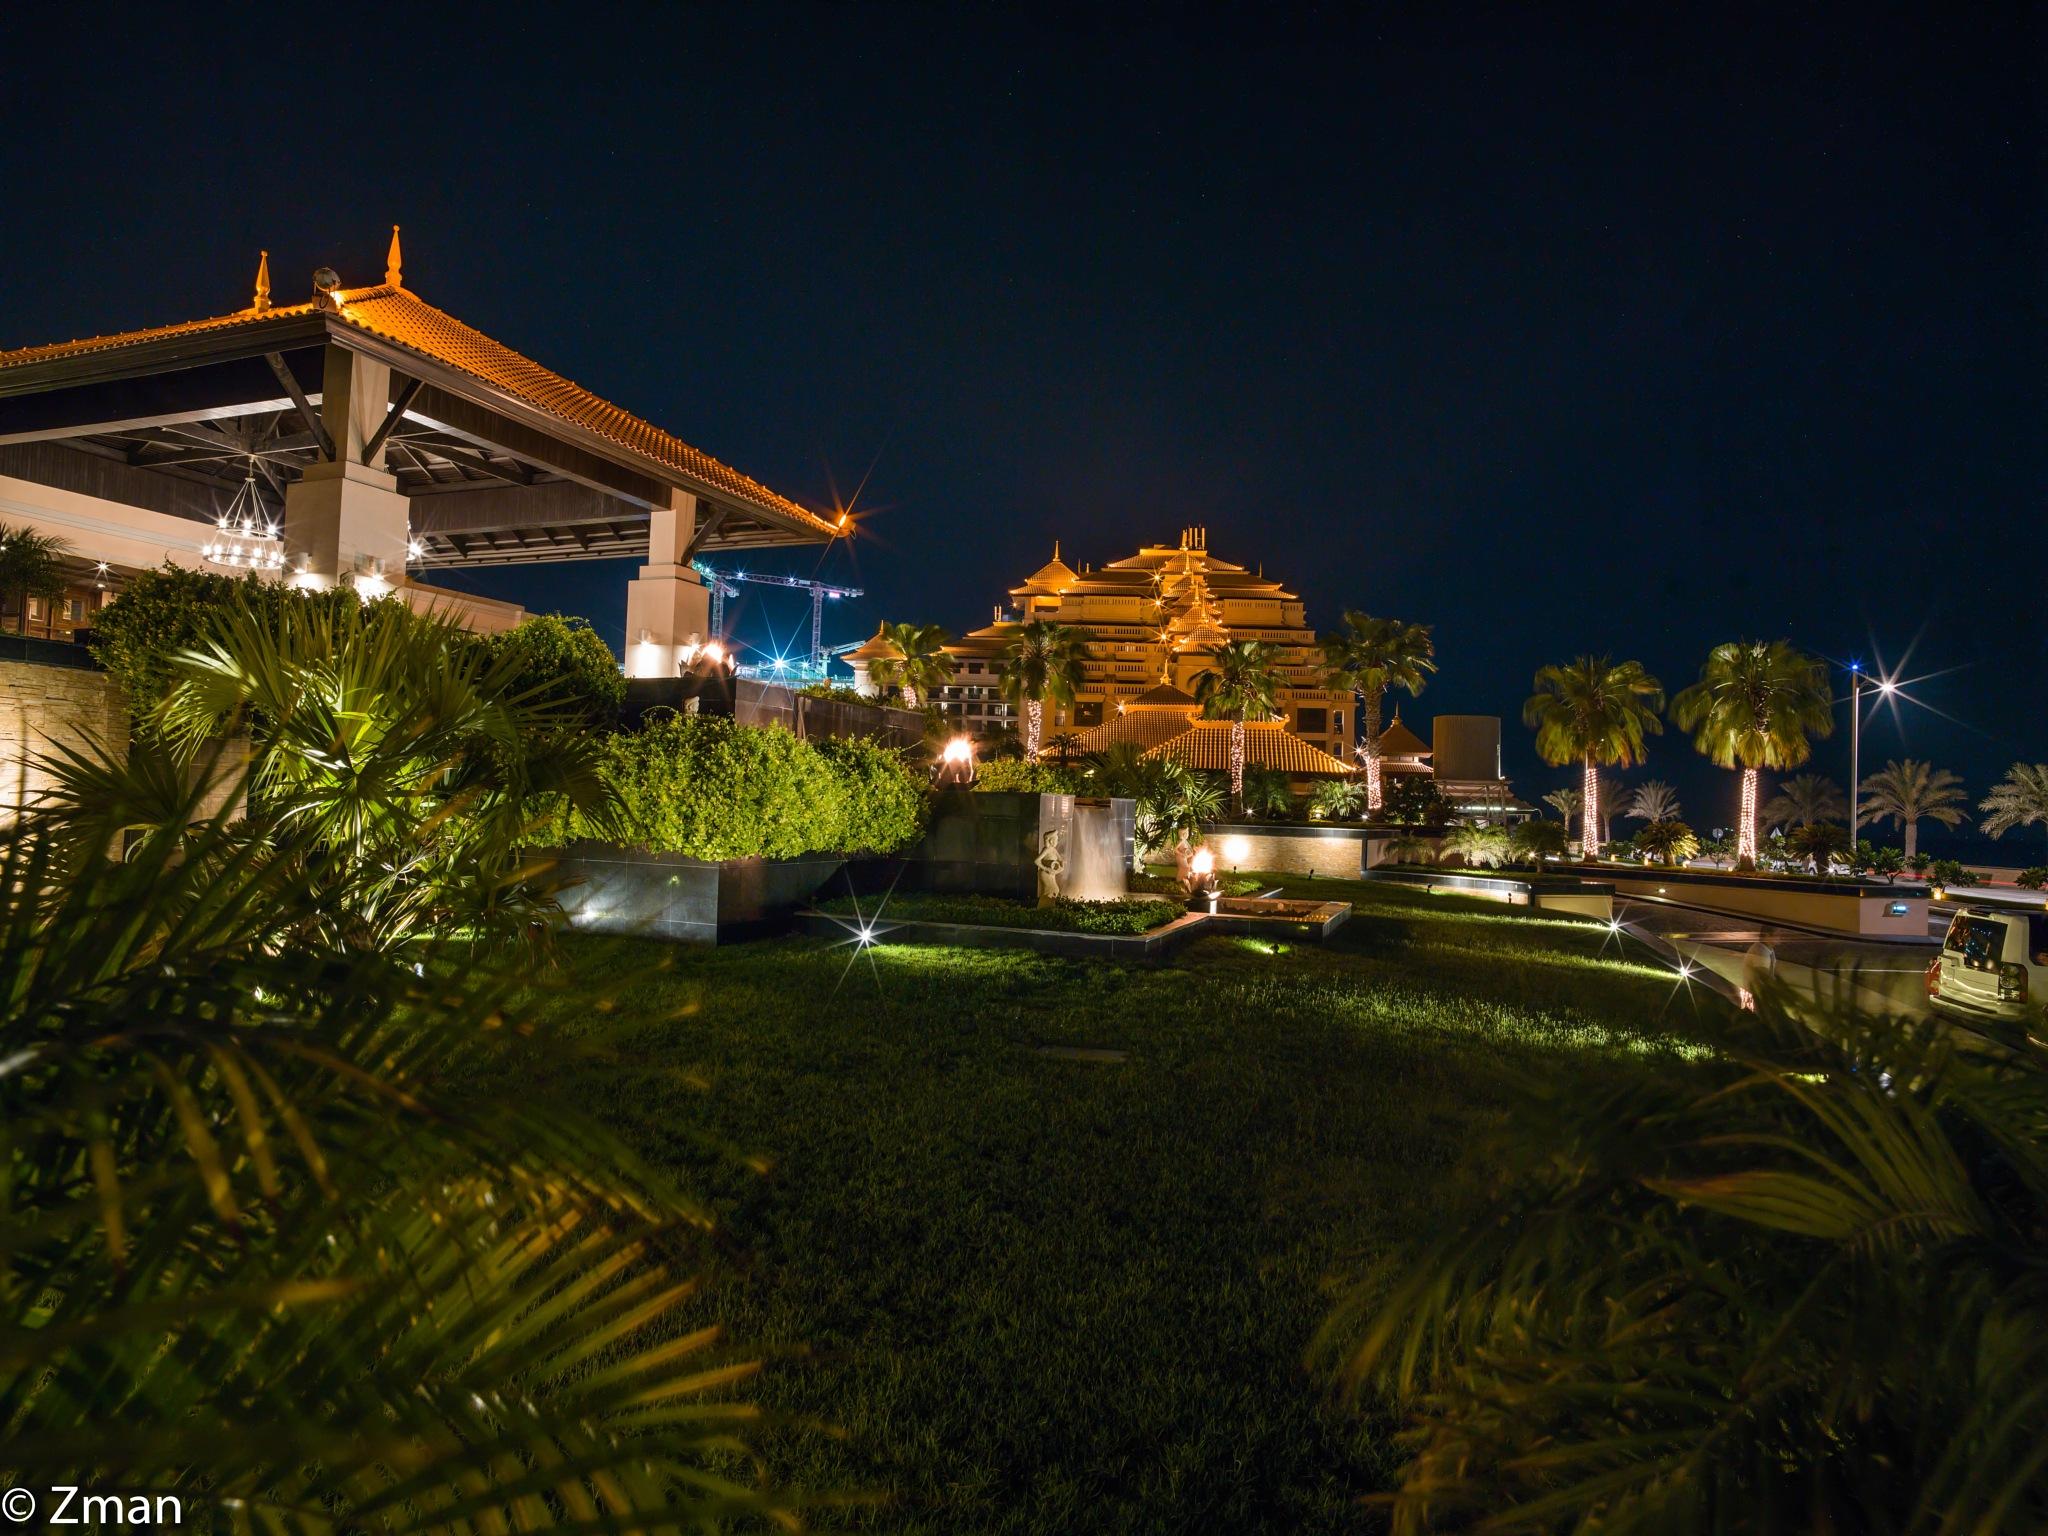 Anantara Hotel And Resort 03 by muhammad.nasser.963